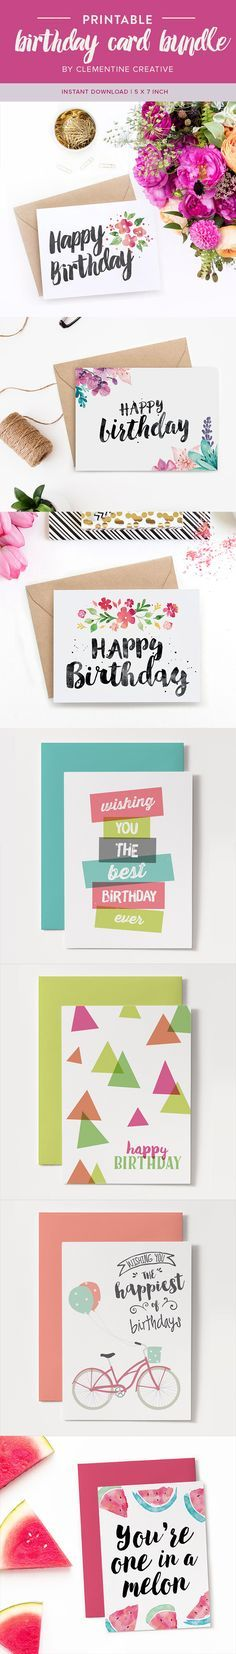 Happy birthday cards for boyfriend -cards birthday awesome creative birthday cards awesome birthday Creative Birthday Cards, Diy Birthday, Happy Birthday Cards, Fiance Birthday, Birthday Tags, 25th Birthday, Birthday Messages, Birthday Greetings, Birthday Presents